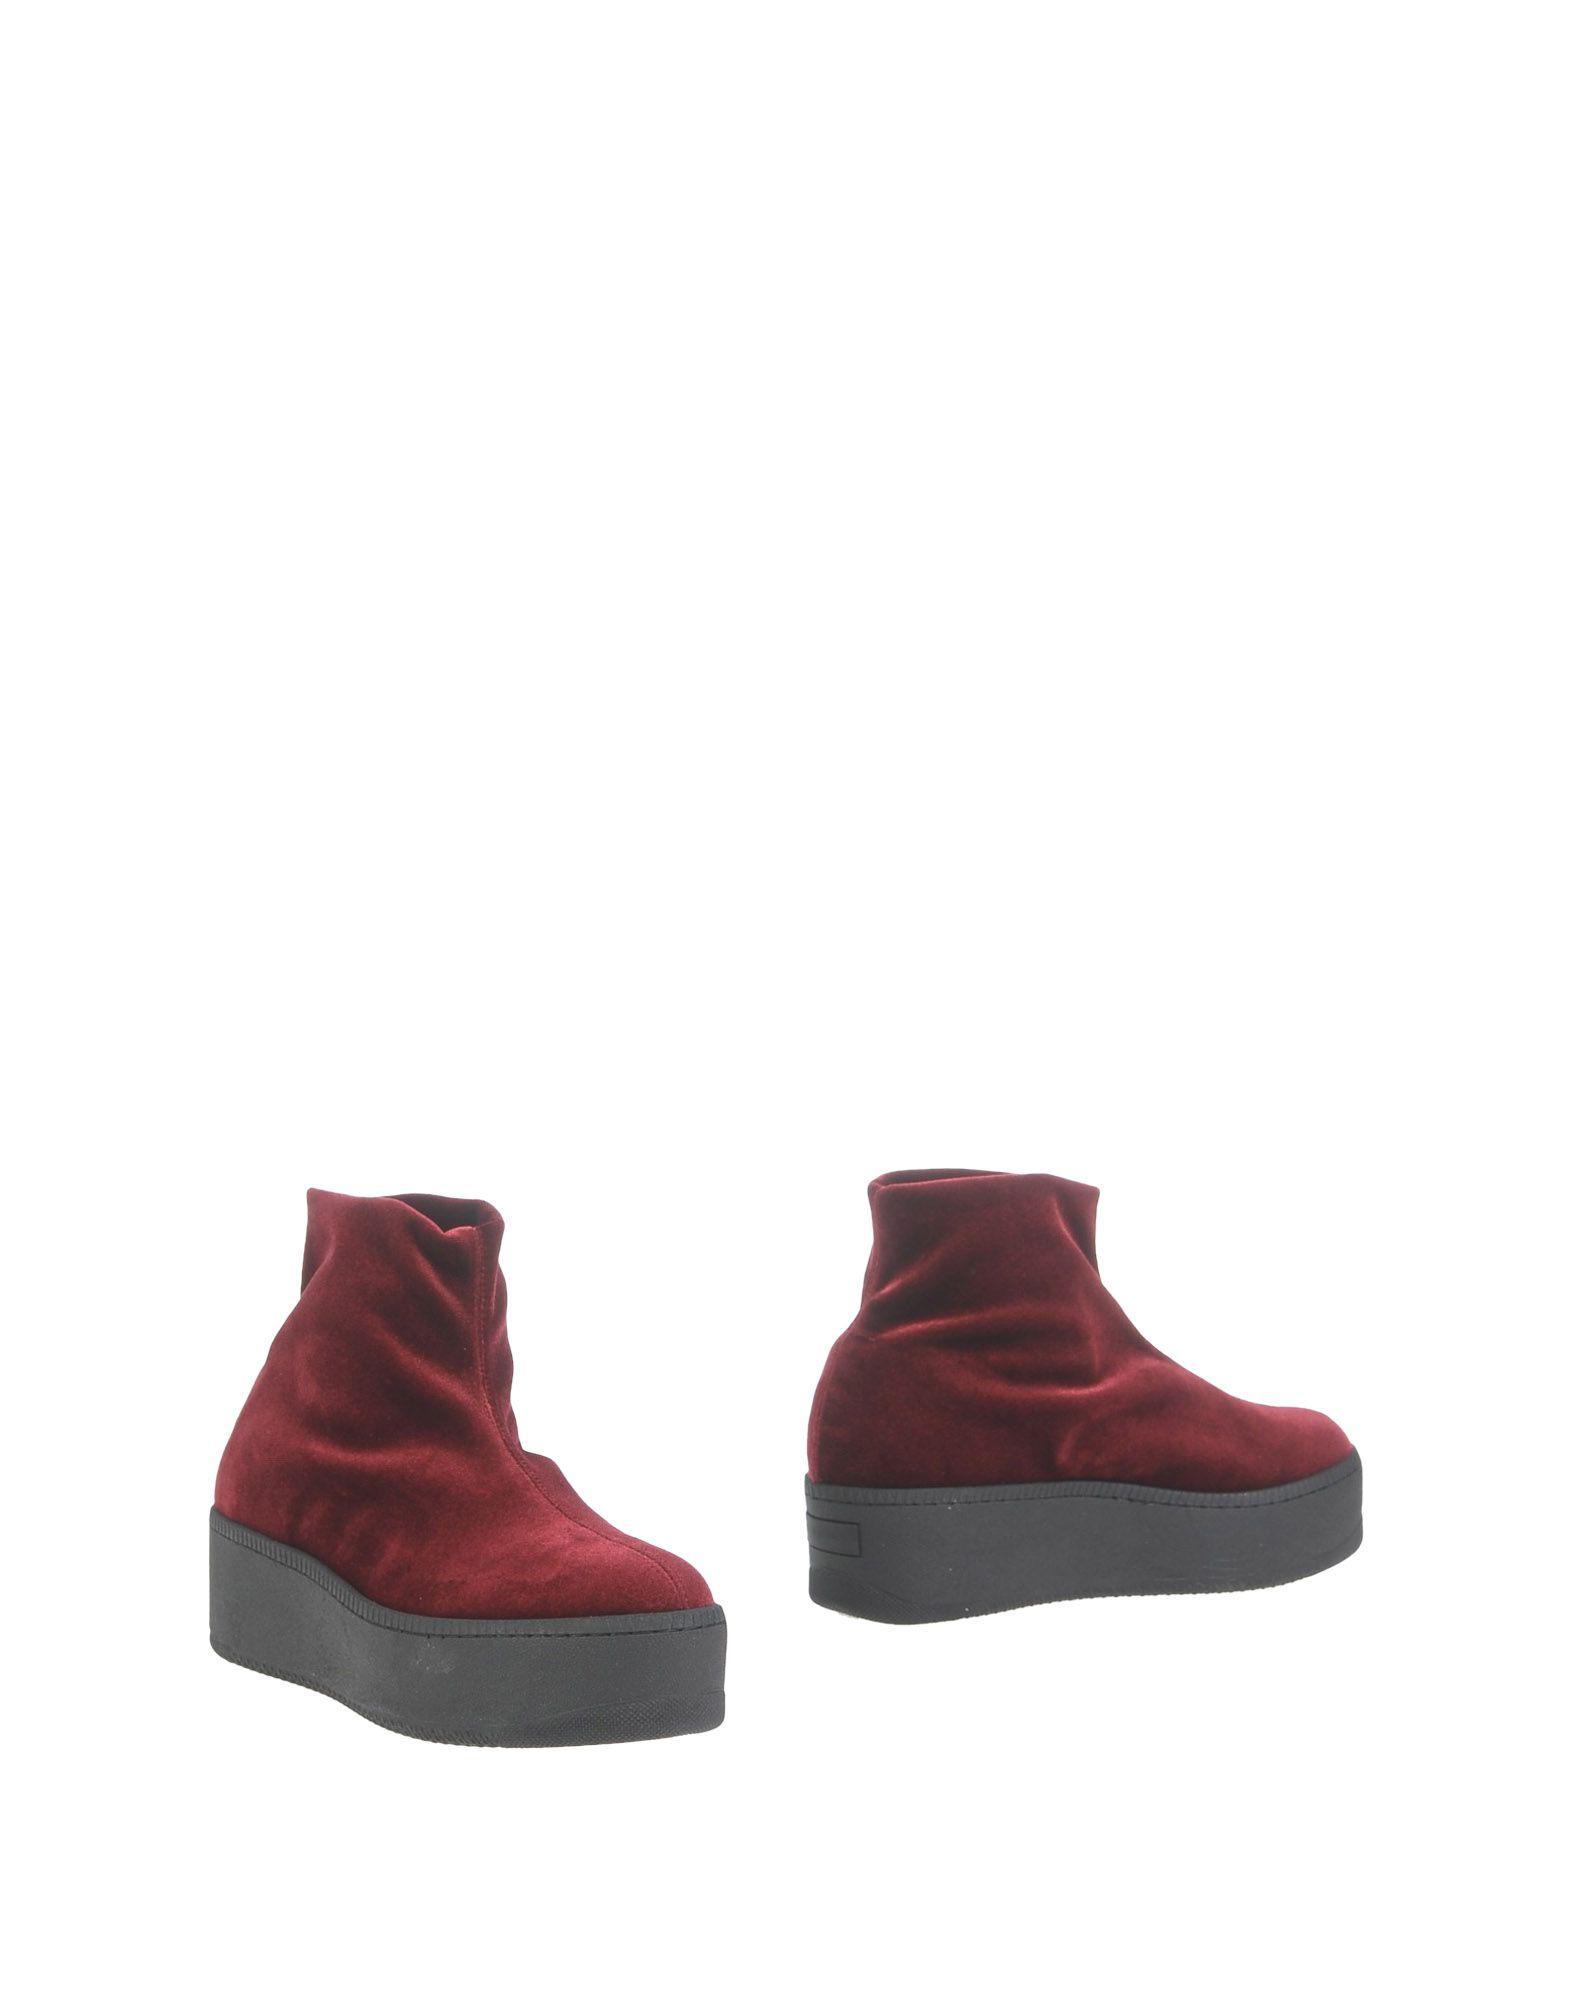 Haltbare Mode billige Schuhe Unlace Stiefelette Damen  11284989UL Heiße Schuhe